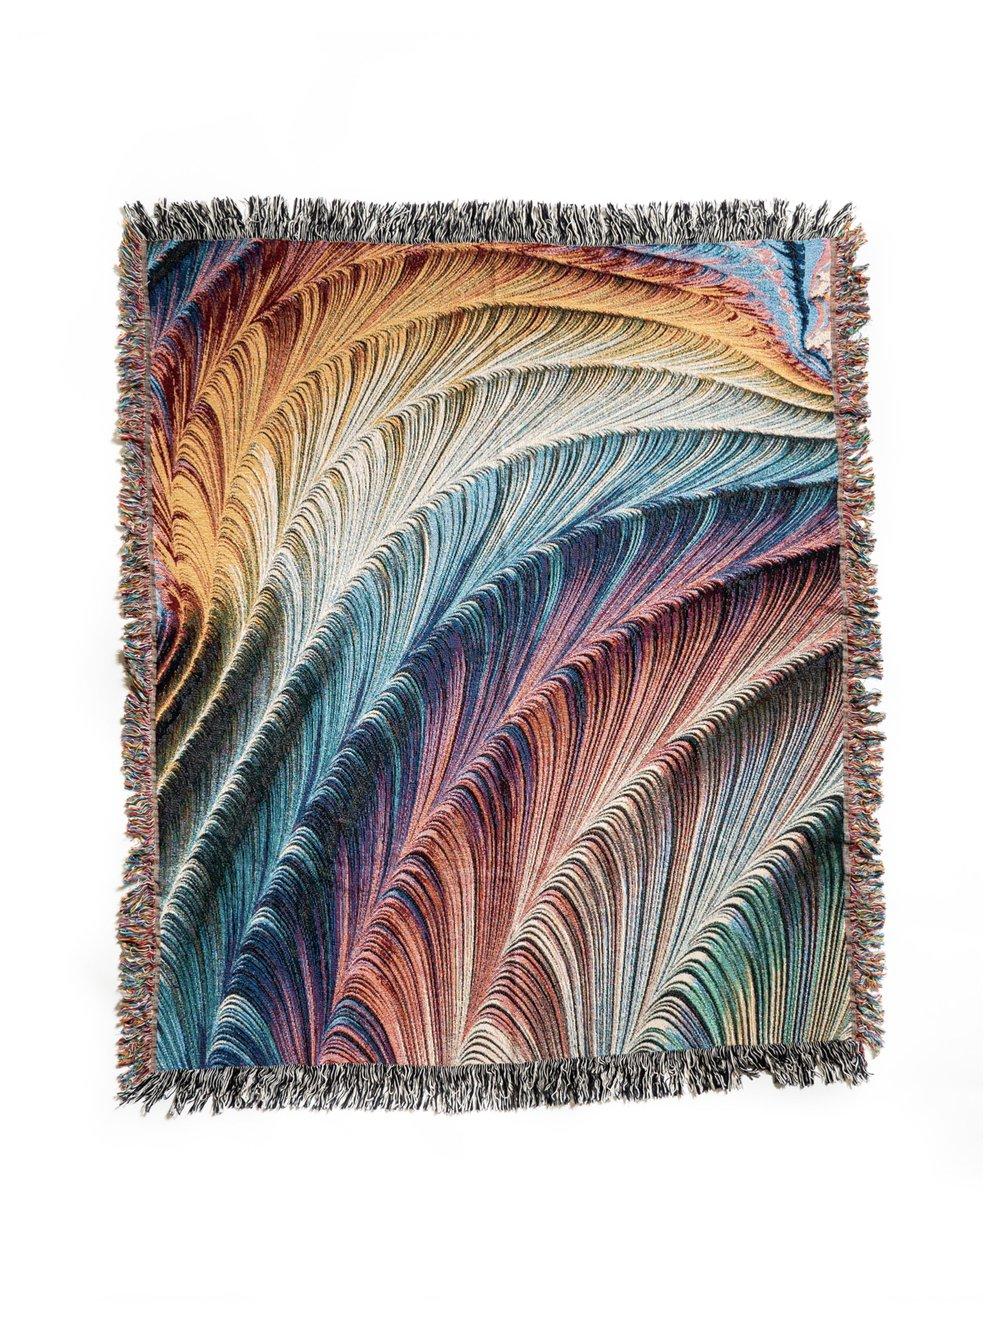 Woven Blanket #4